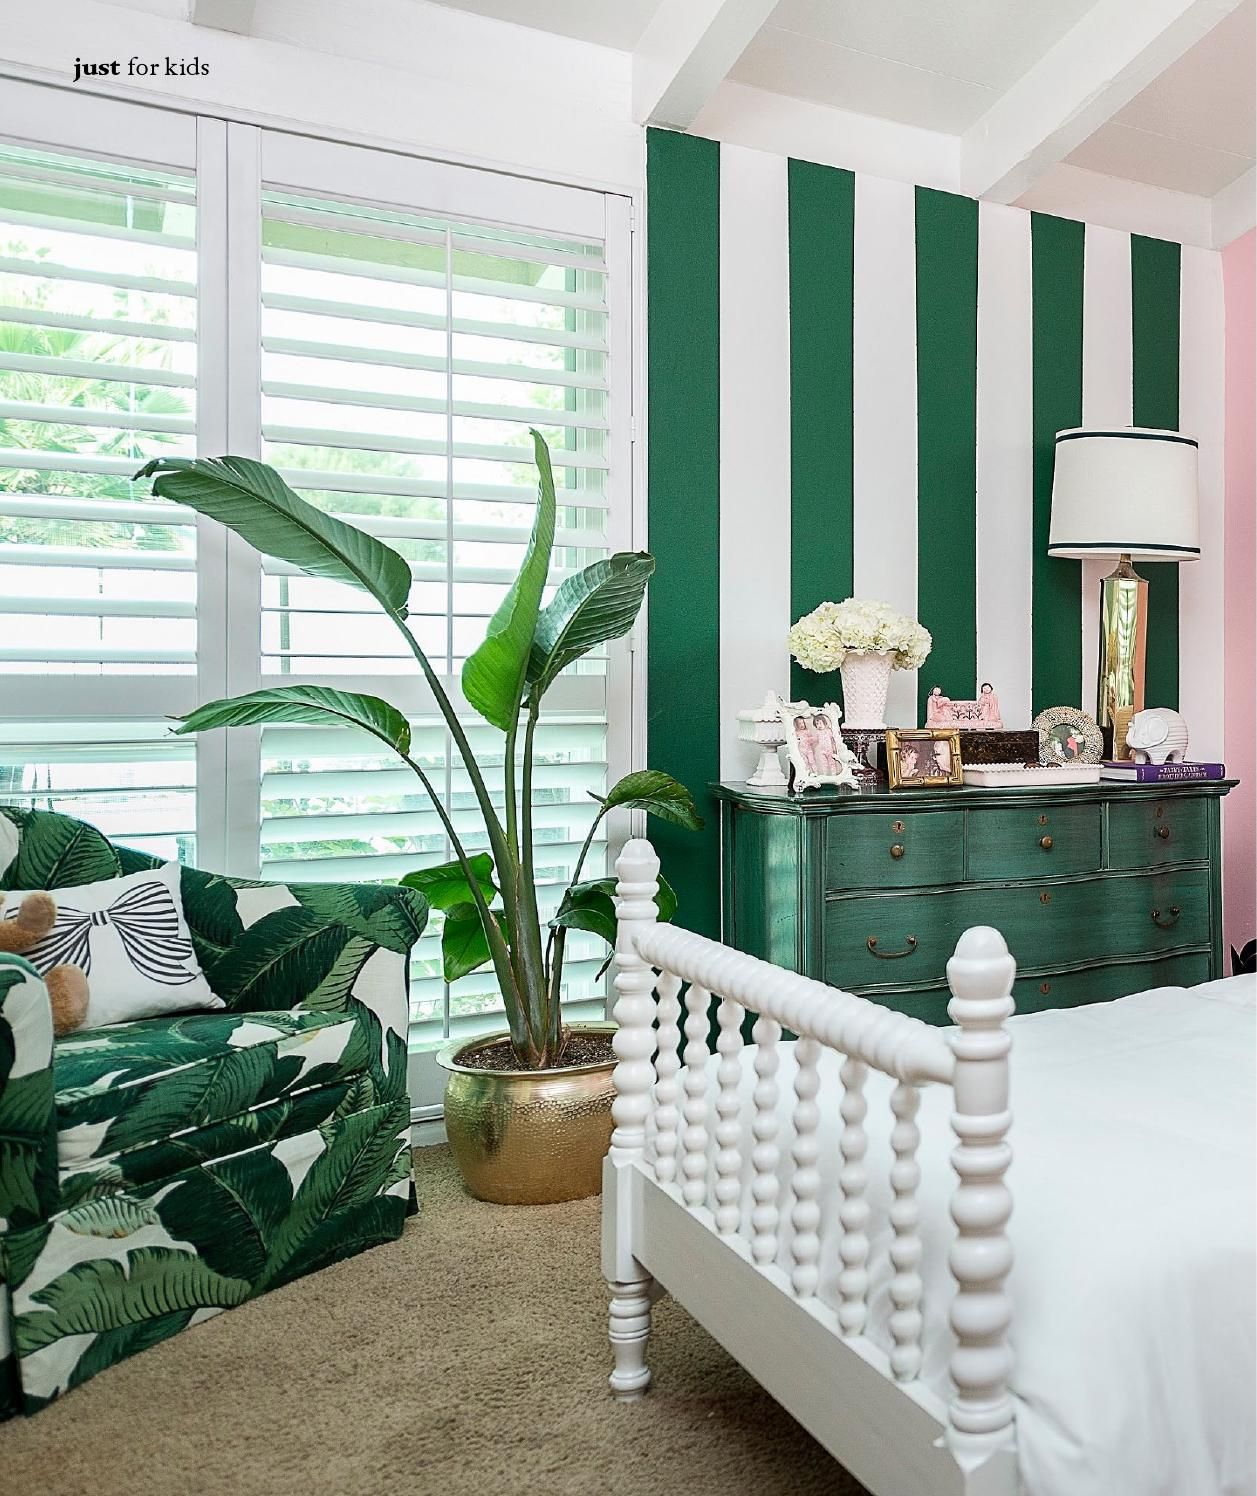 Hotel style inspiration beverly hills hotel decorating for Hotel decor inspiration